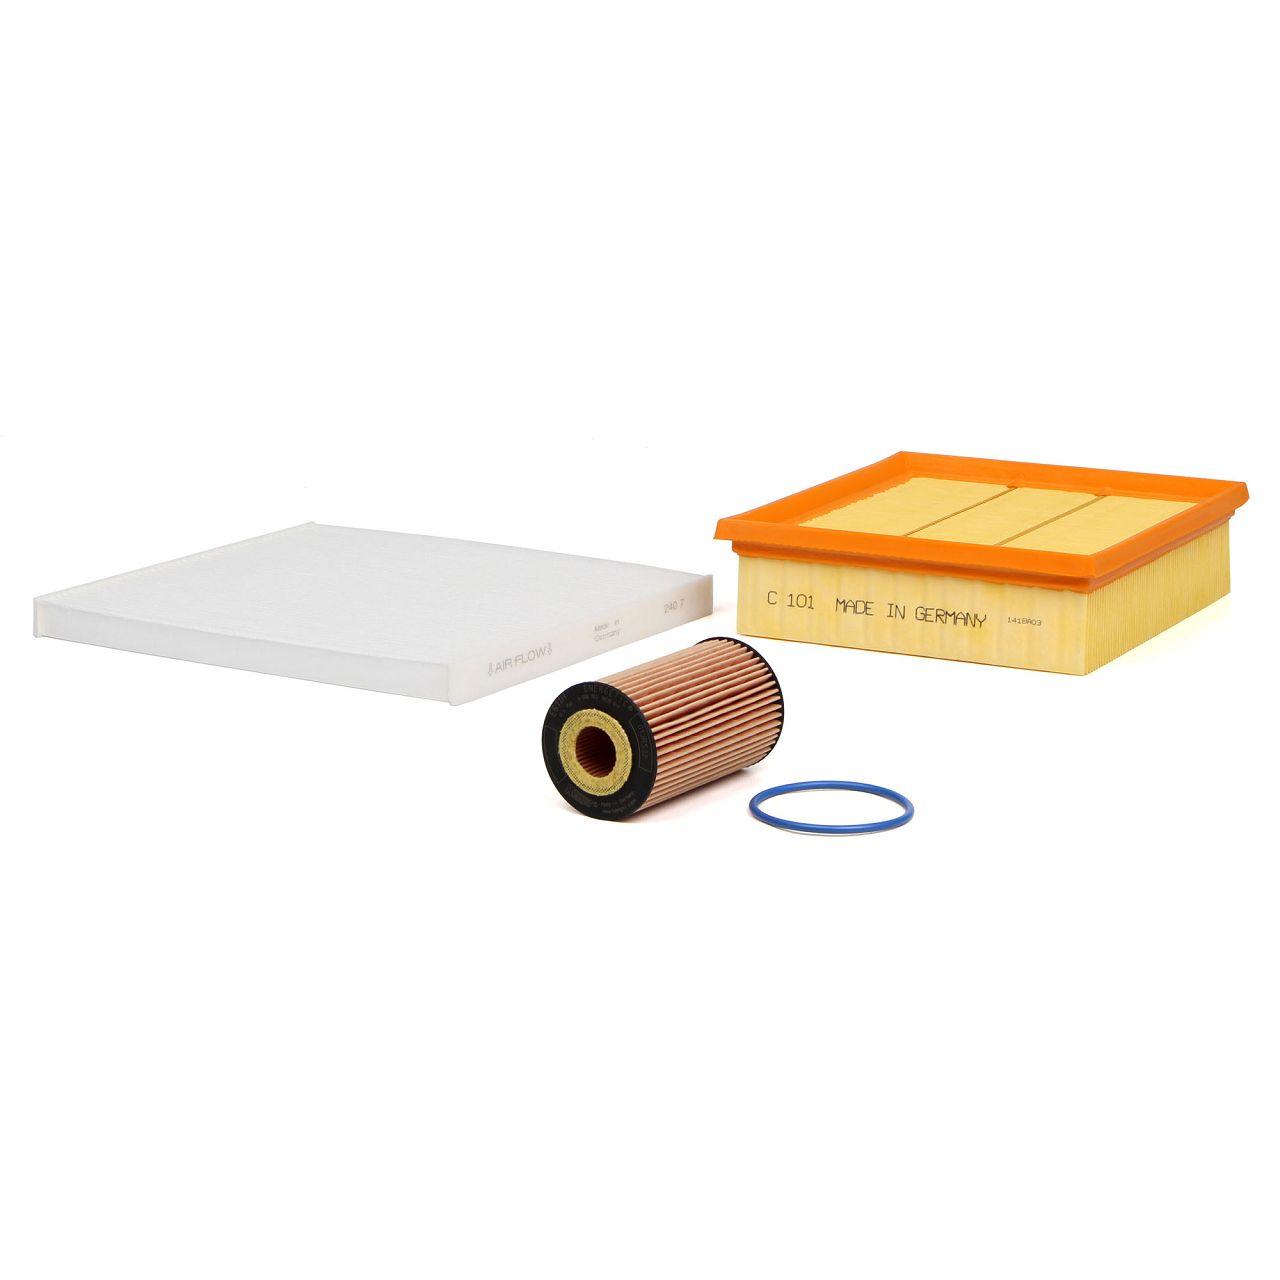 Filterpaket Filterset für Opel Corsa D 1.0 1.2/LPG 1.4/LPG 60-100 PS